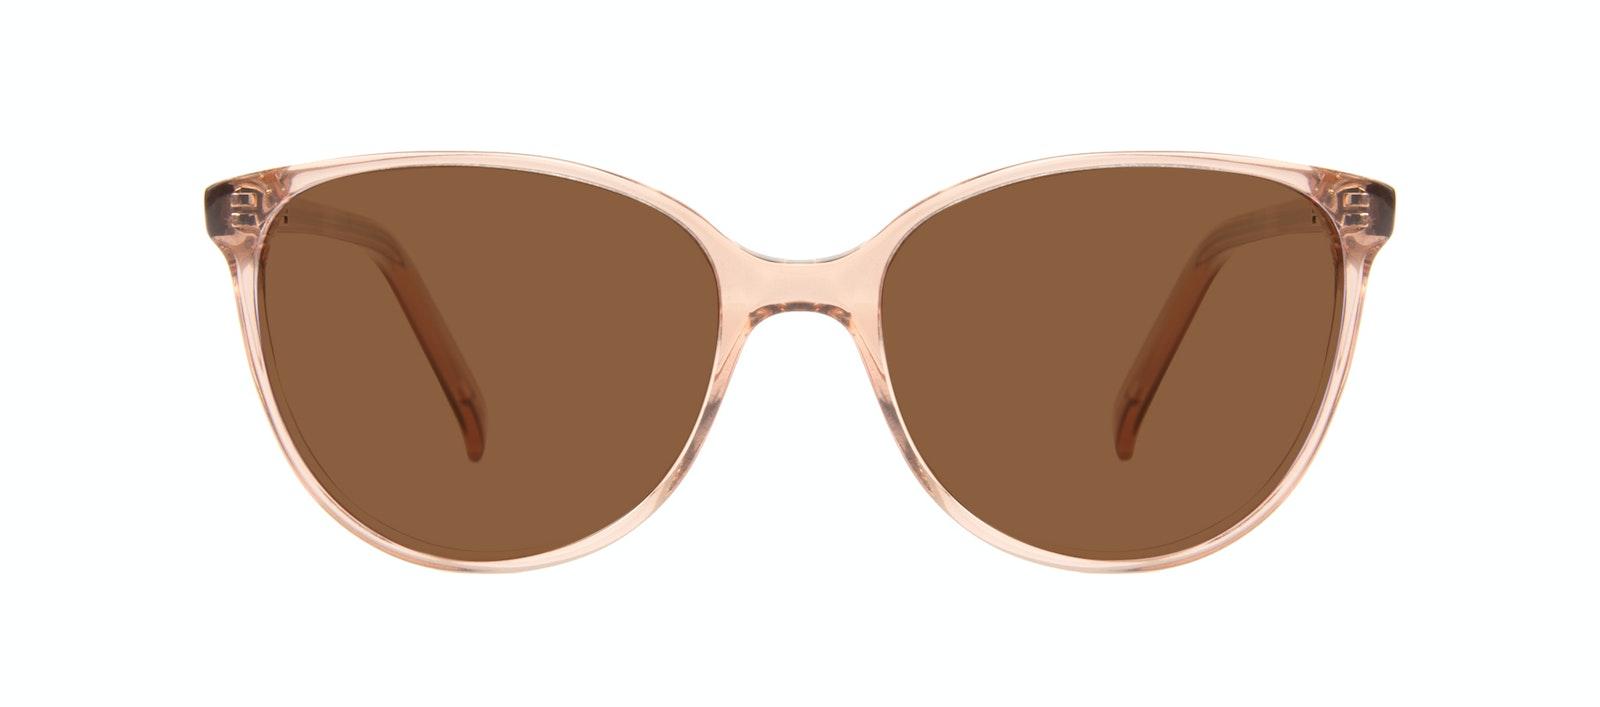 Affordable Fashion Glasses Round Sunglasses Women Imagine Petite Rose Front